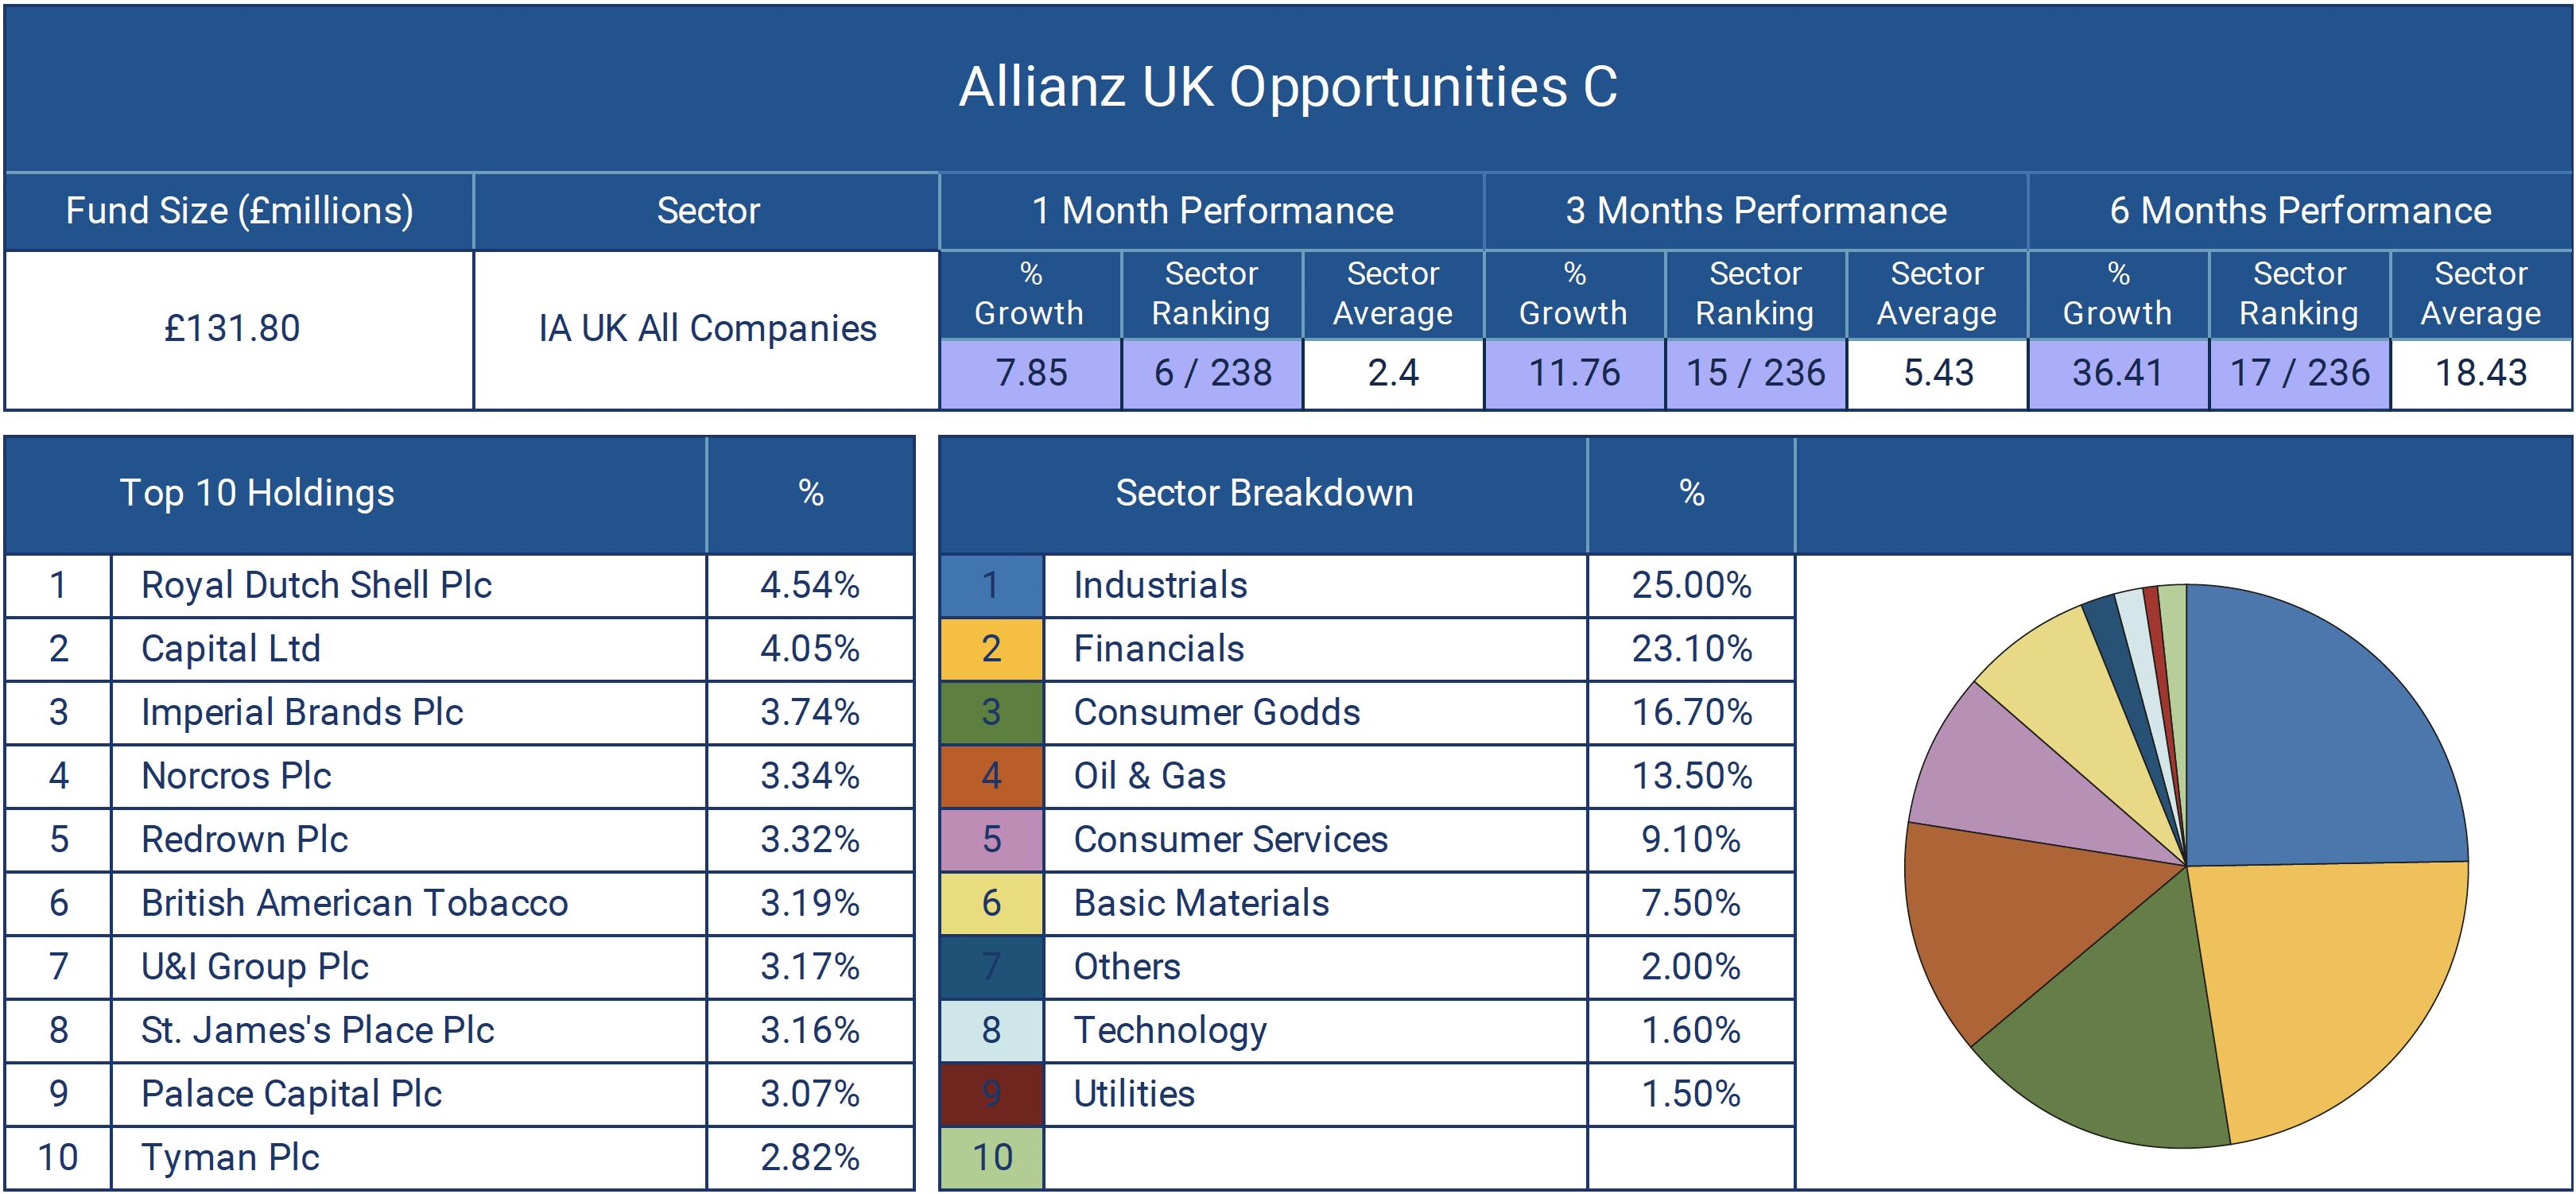 Allianz UK Opportunities